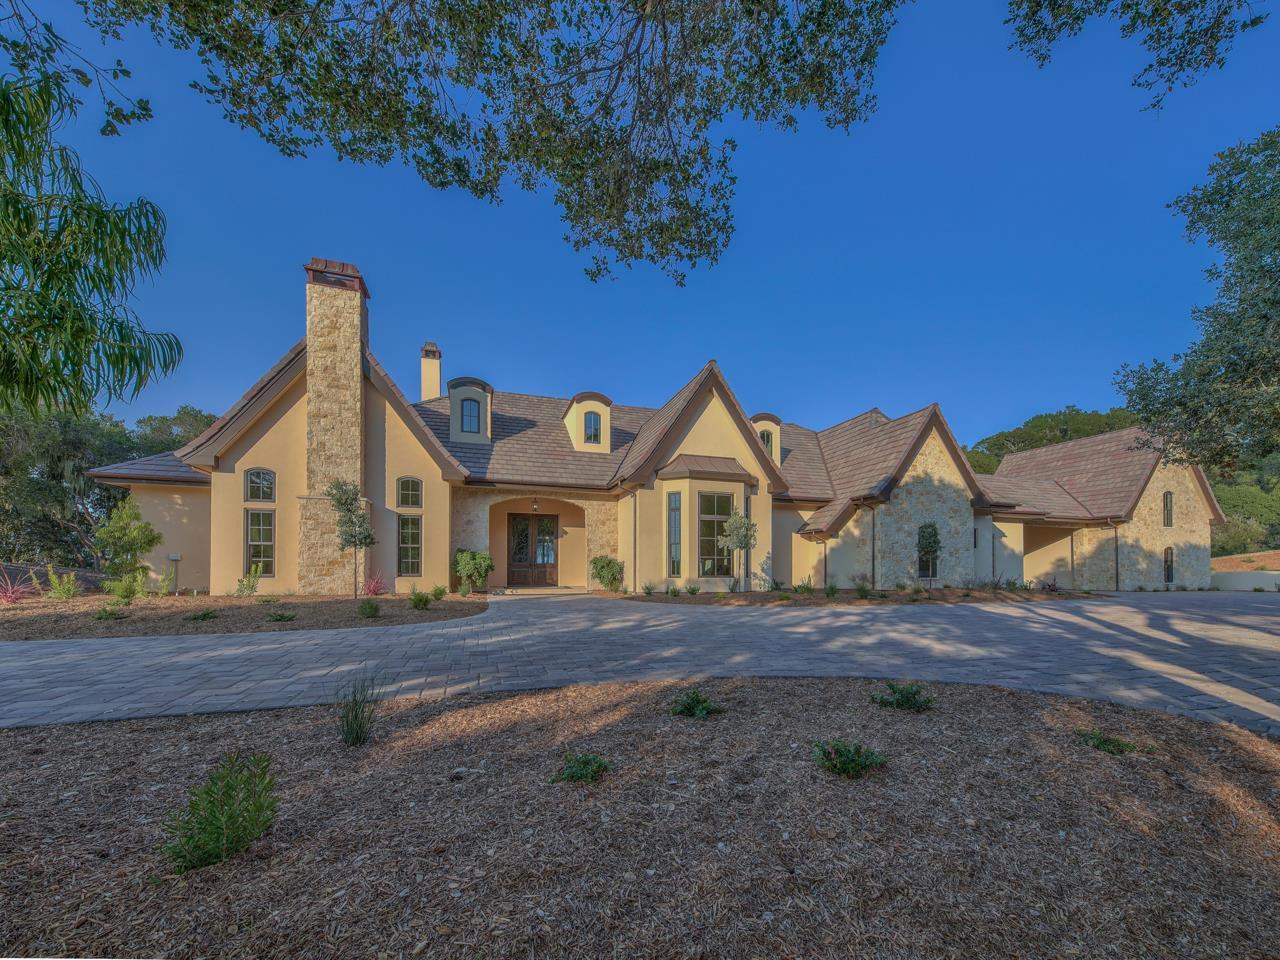 Photo of 7835 Monterra Oaks RD, MONTEREY, CA 93940